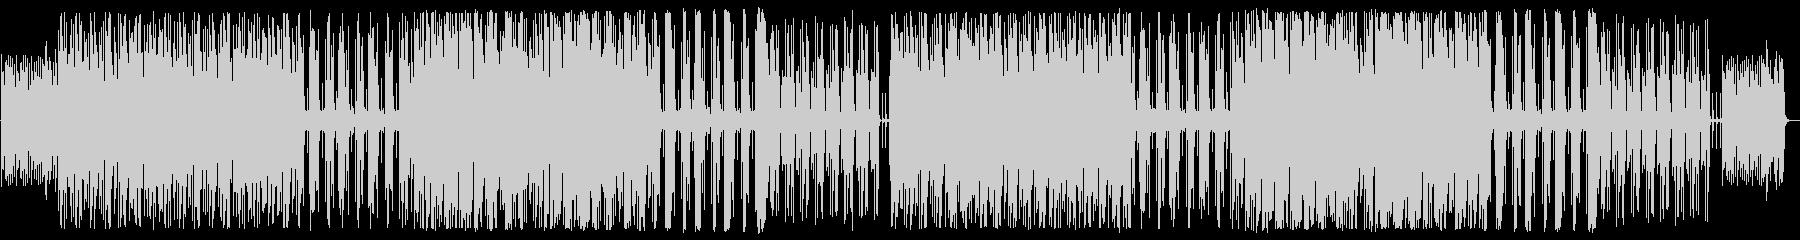 YouTube ピアノ・リズミカルの未再生の波形